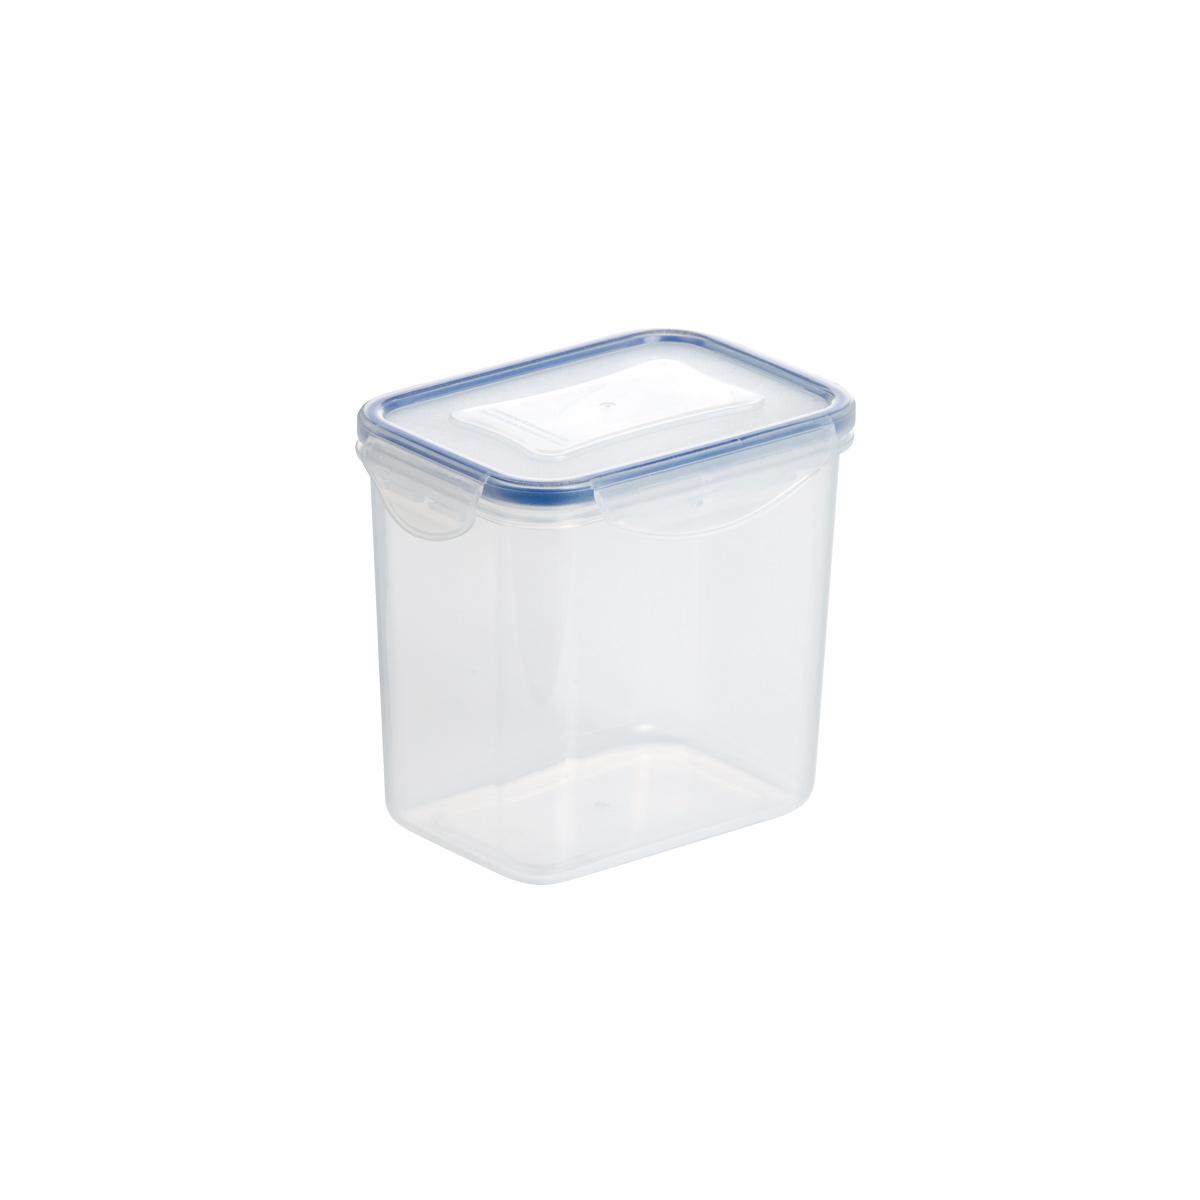 Dóza FRESHBOX 0.9 l, vysoká